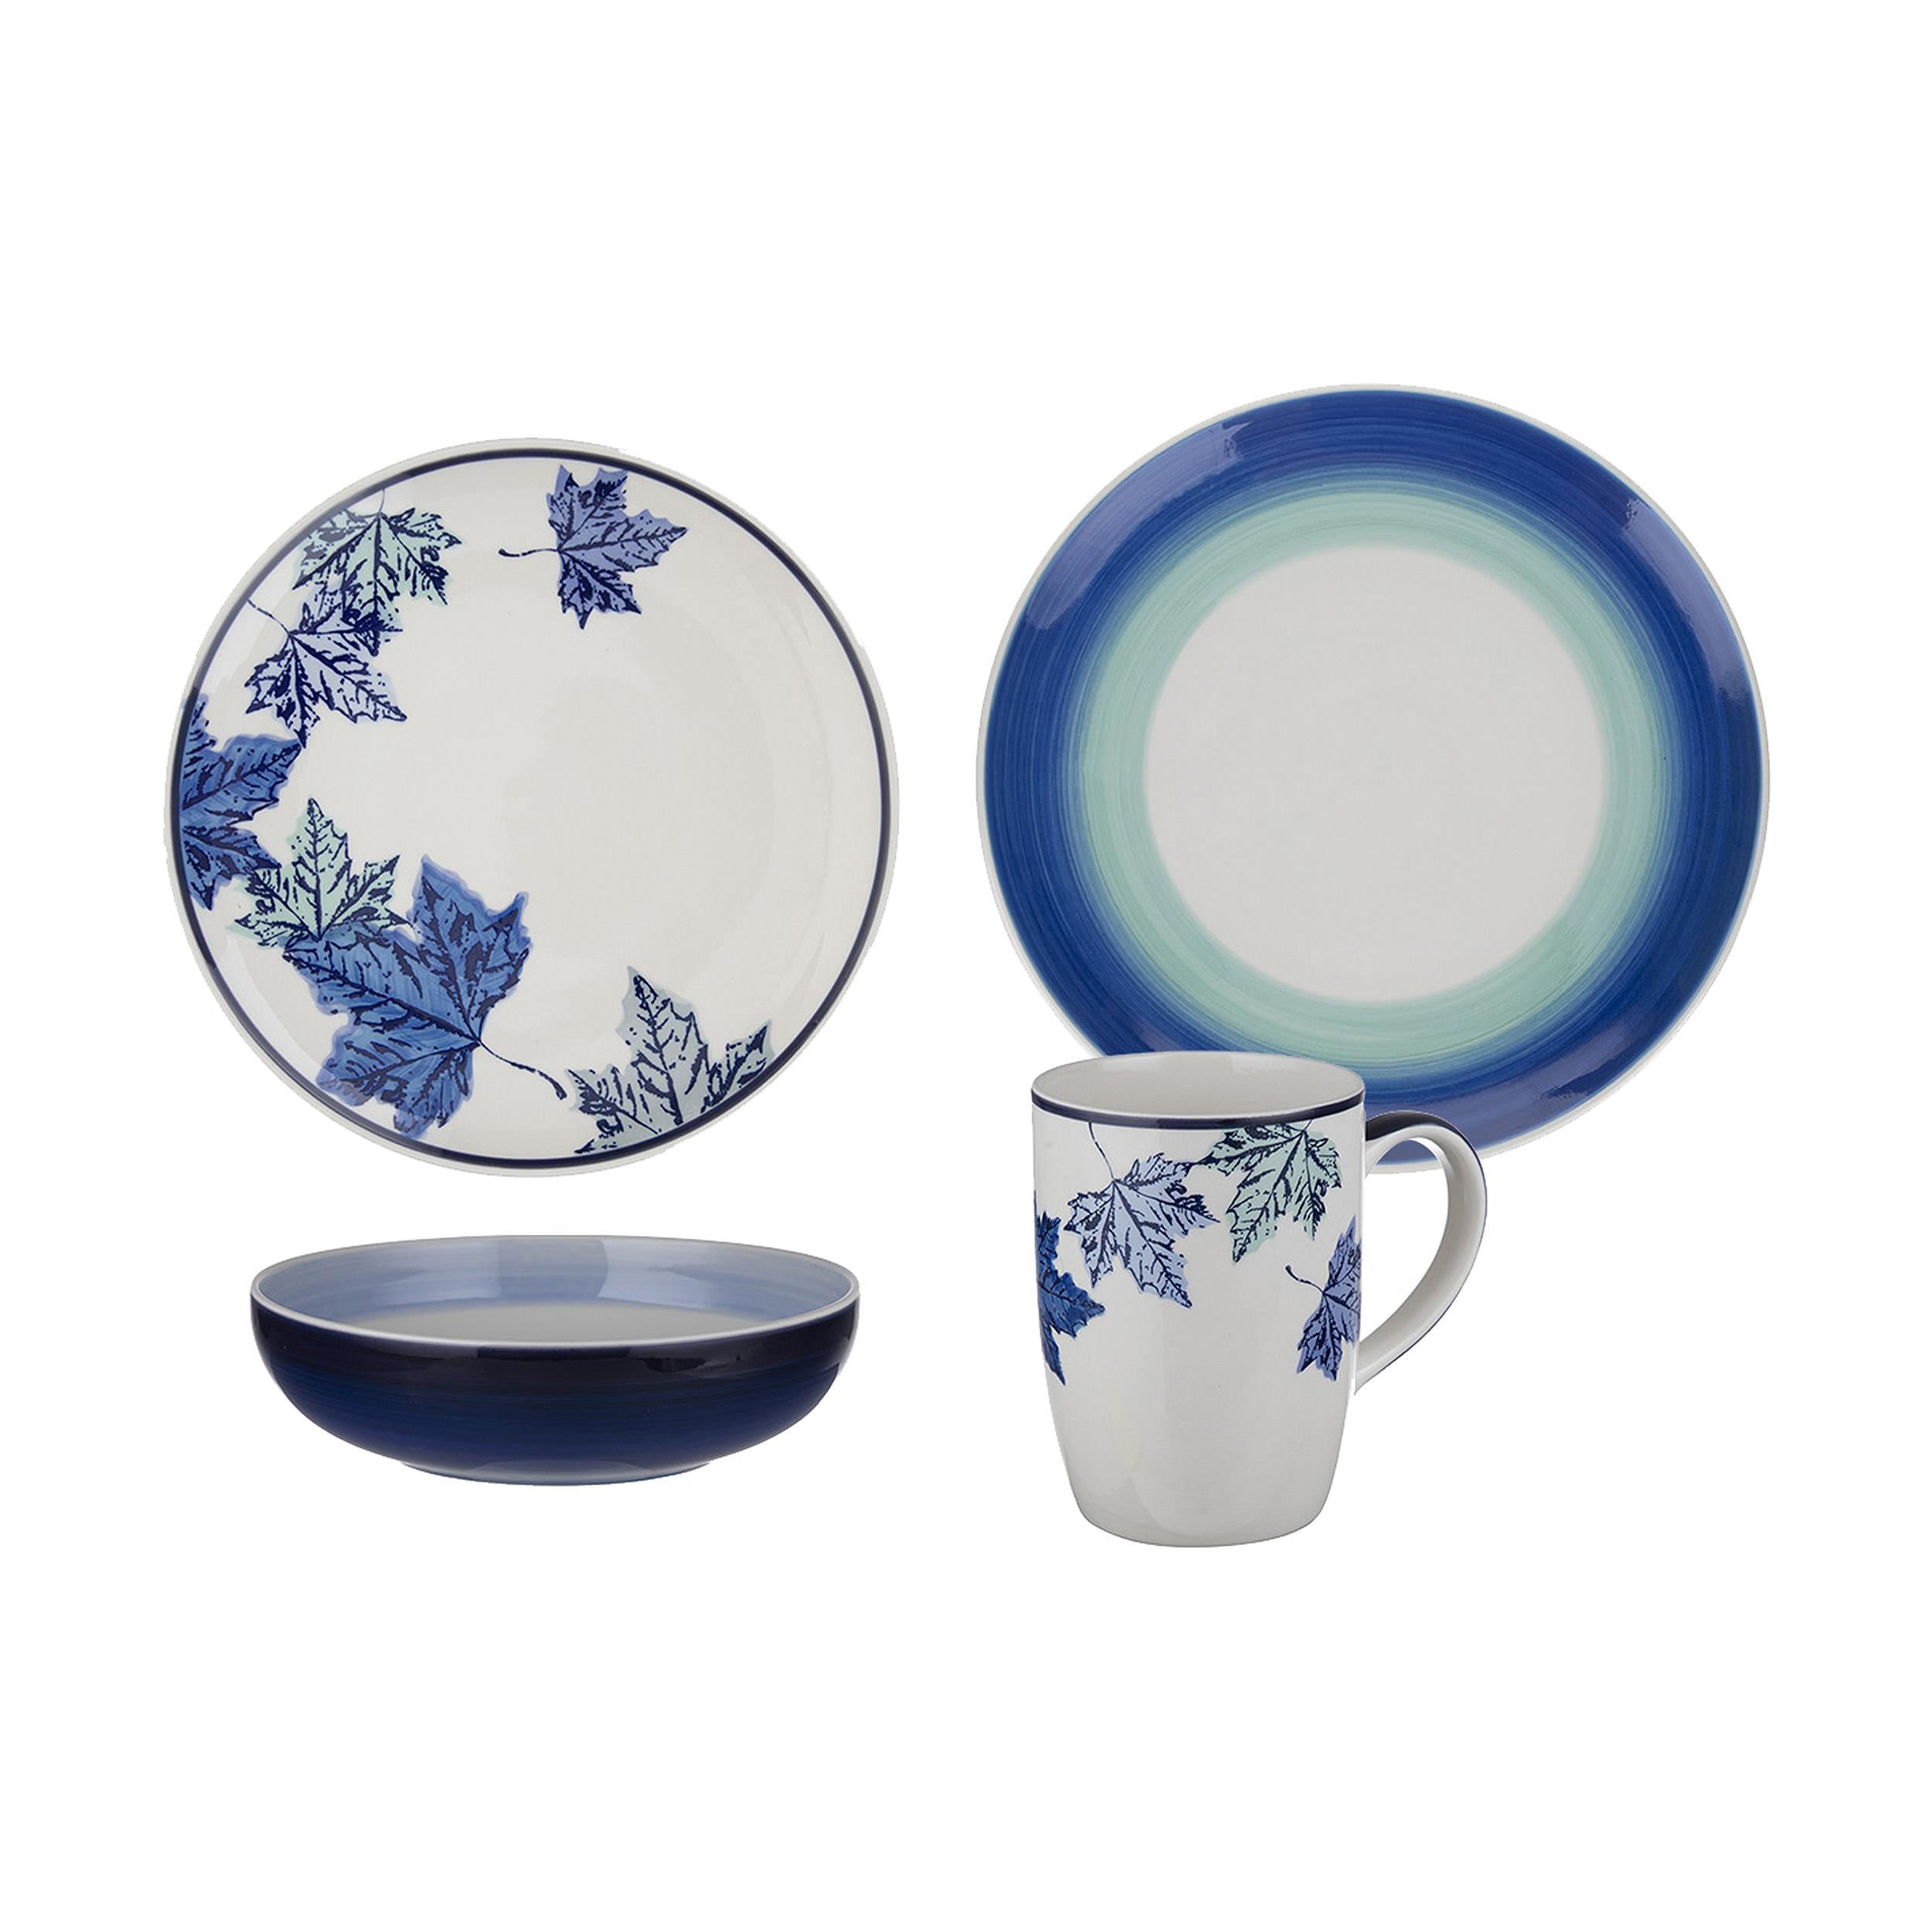 عکس سرویس ظروف غذا خوری 16 پارچه سرامیکی مدل Blue Fall